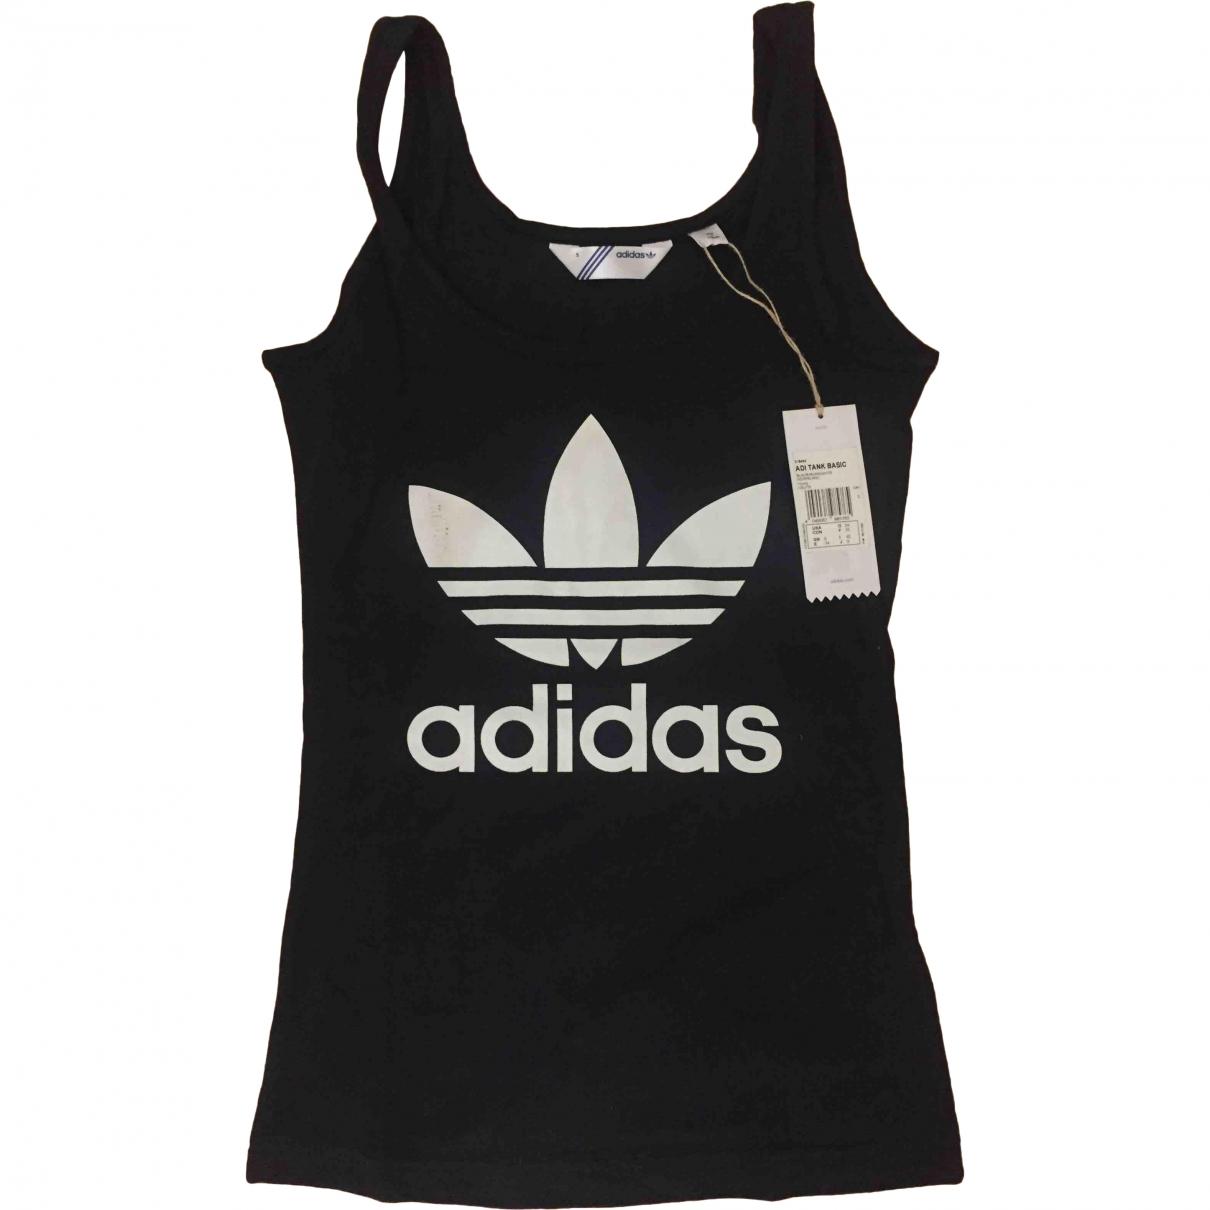 Adidas \N Black Cotton  top for Women S International